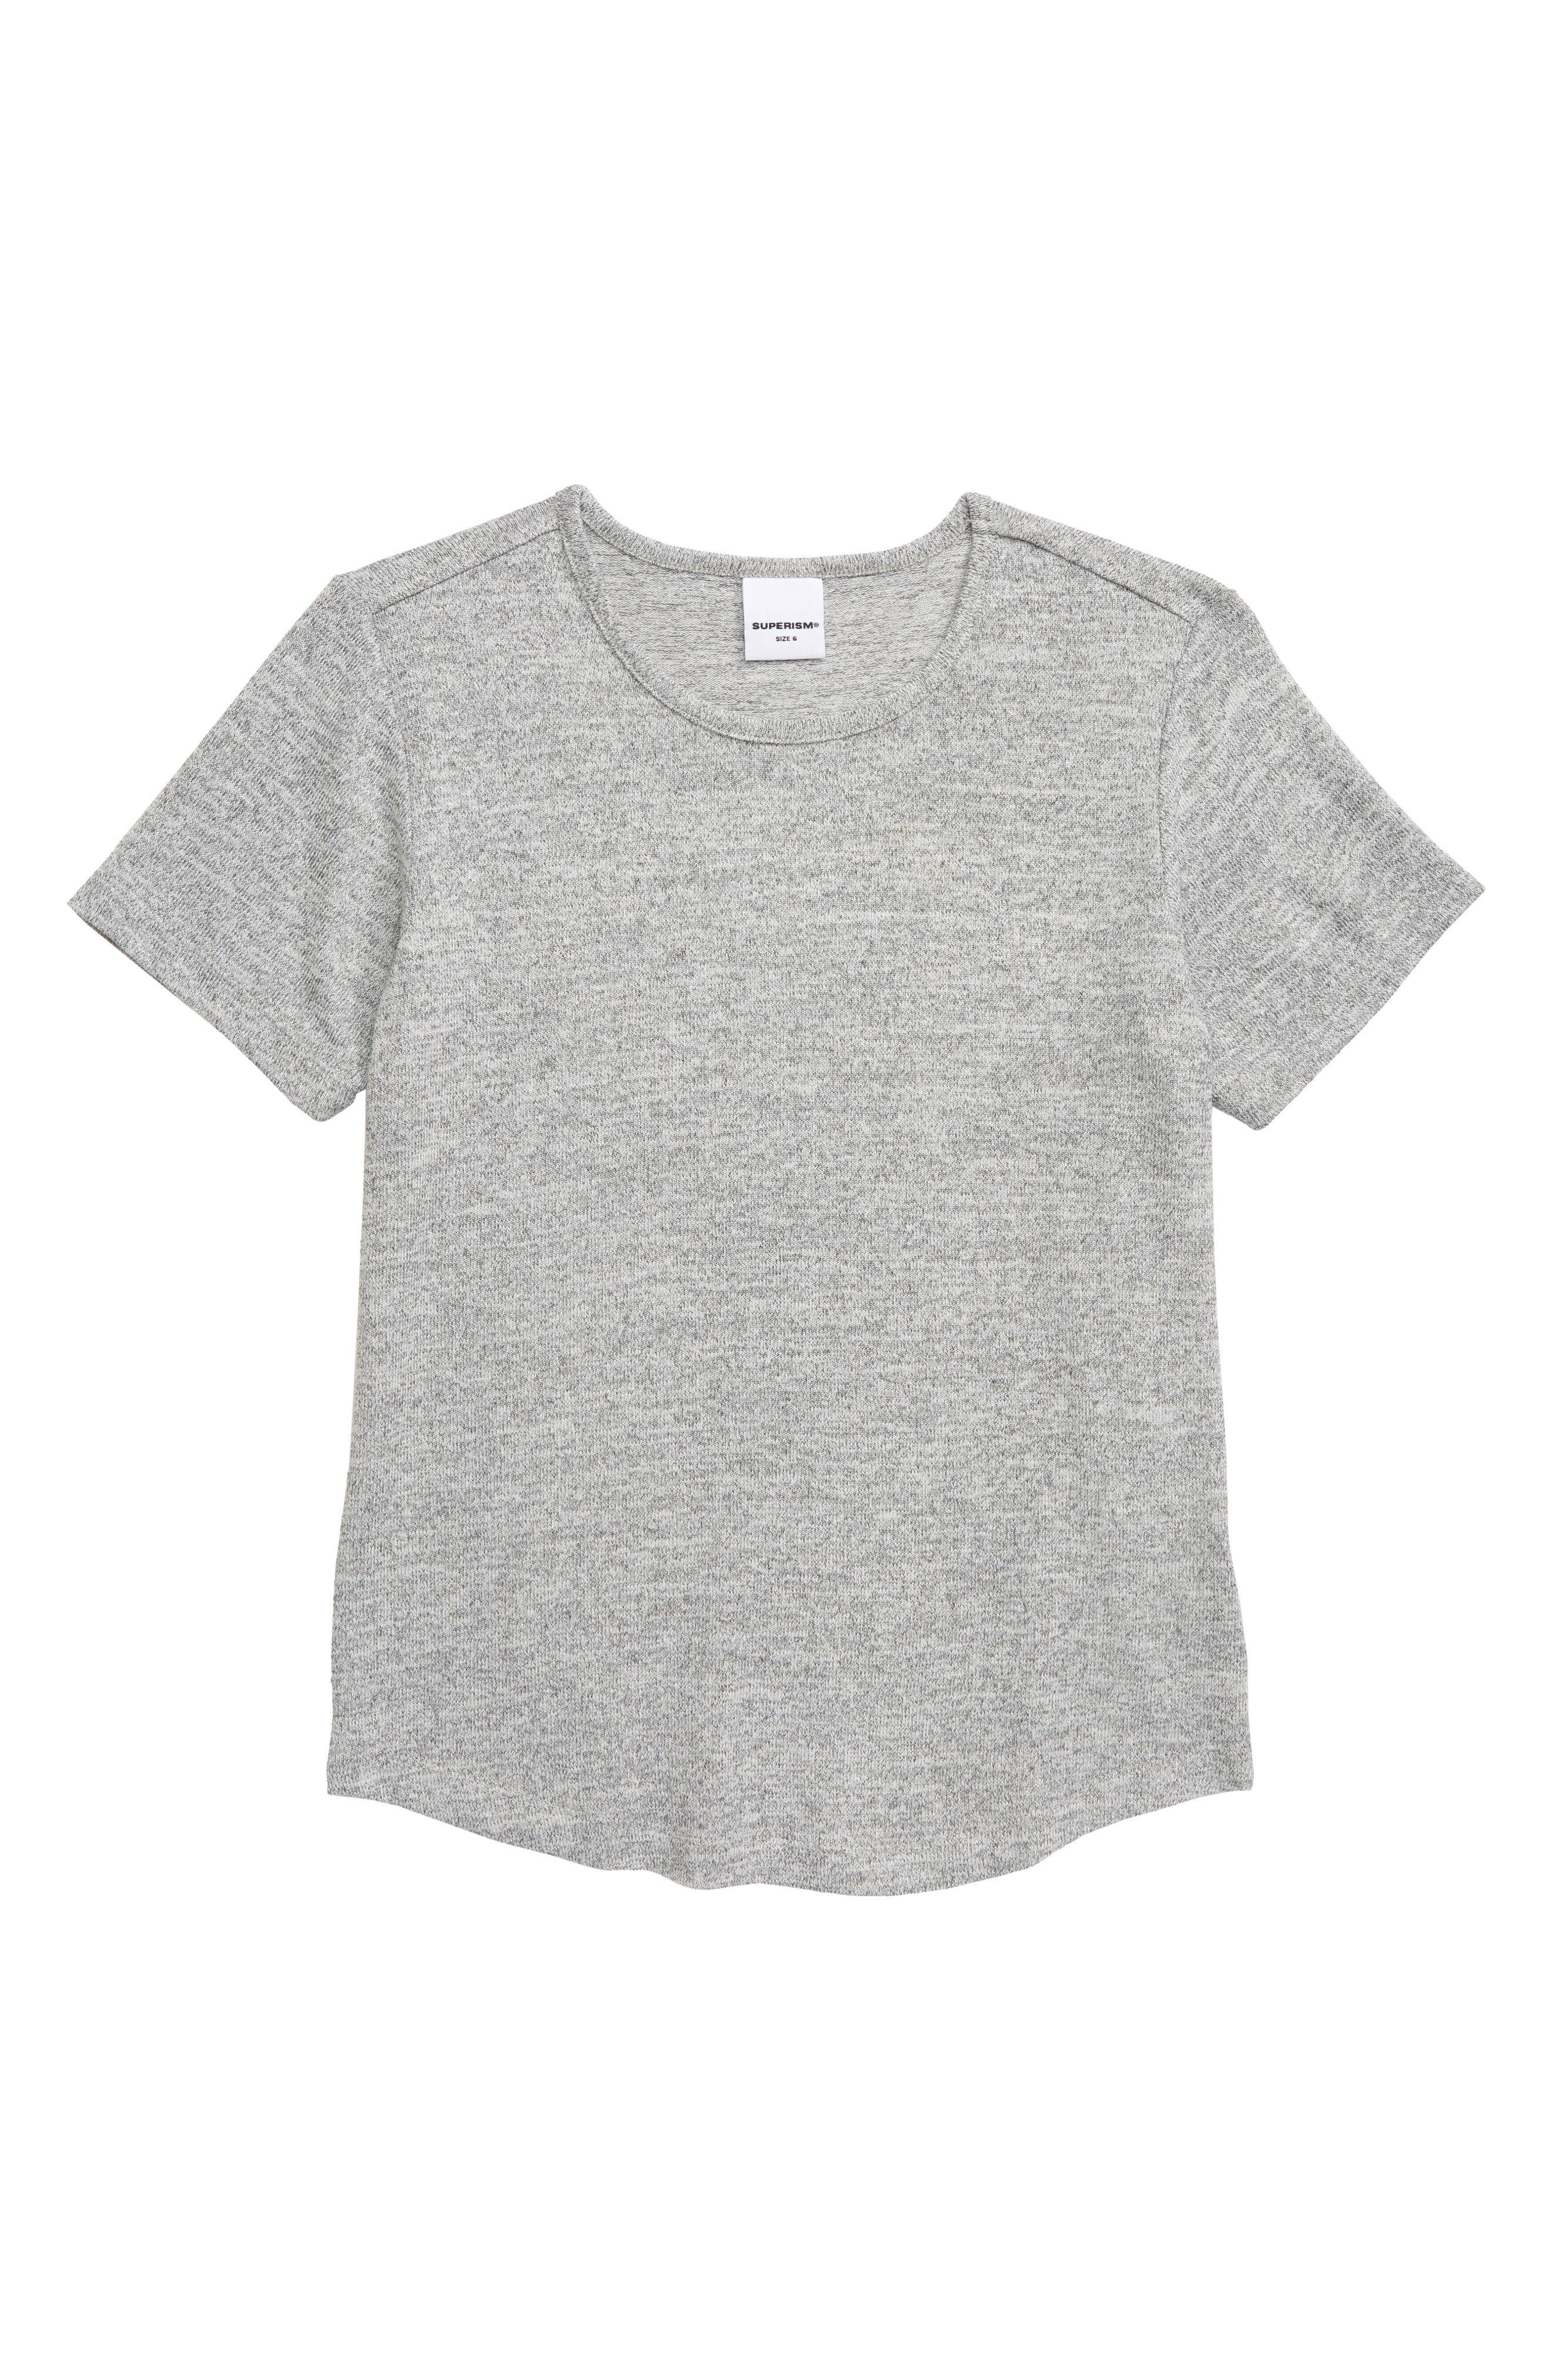 fafab6c1c22 Kids' SUPERISM Apparel: T-Shirts, Jeans, Pants & Hoodies   Nordstrom